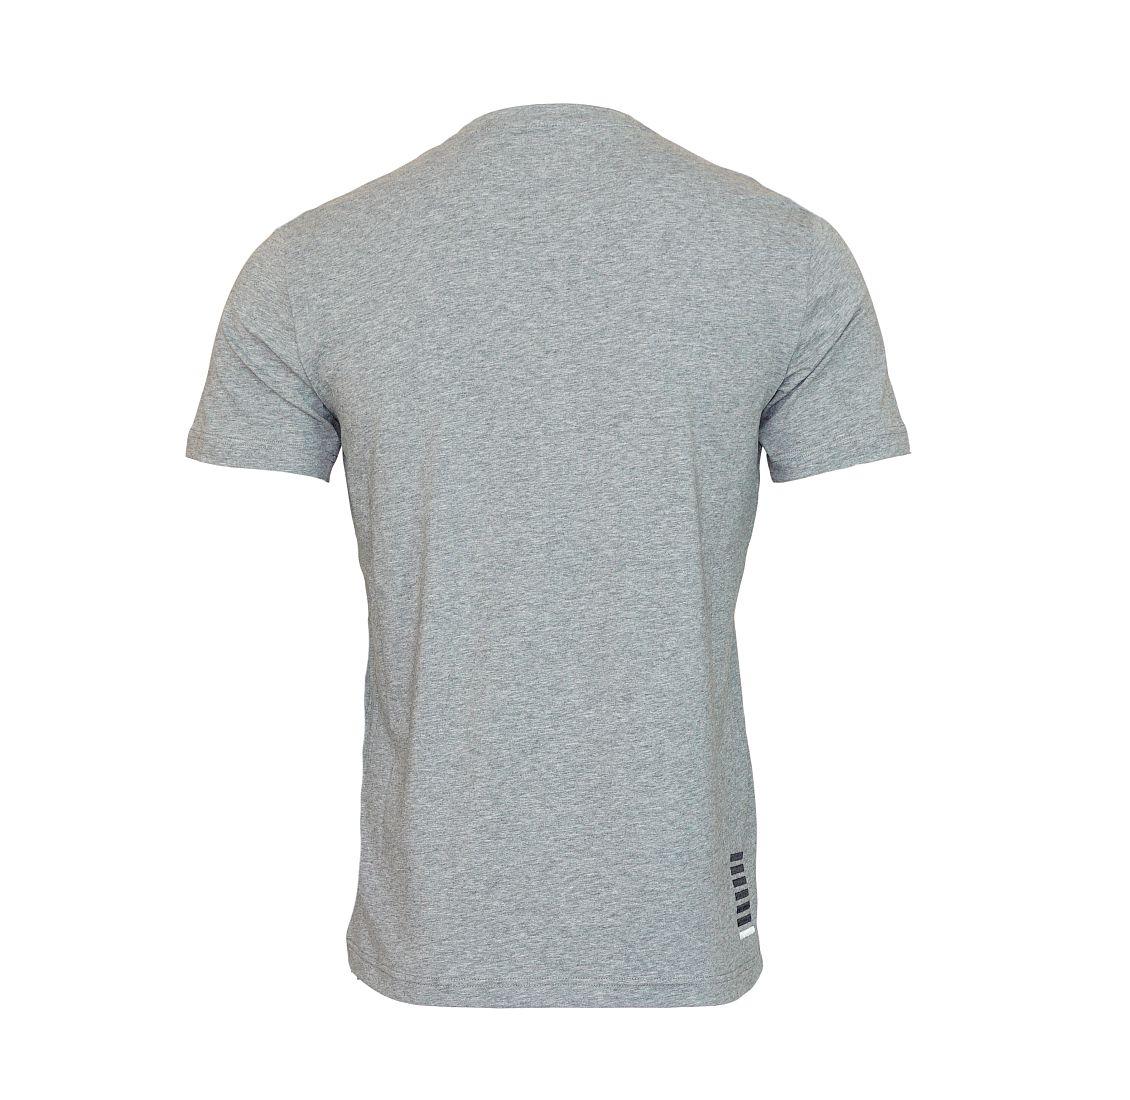 EA7 EMPORIO ARMANI Shirt T-Shirt Poloshirt grau Train Core Tee 273164 6P209 01449